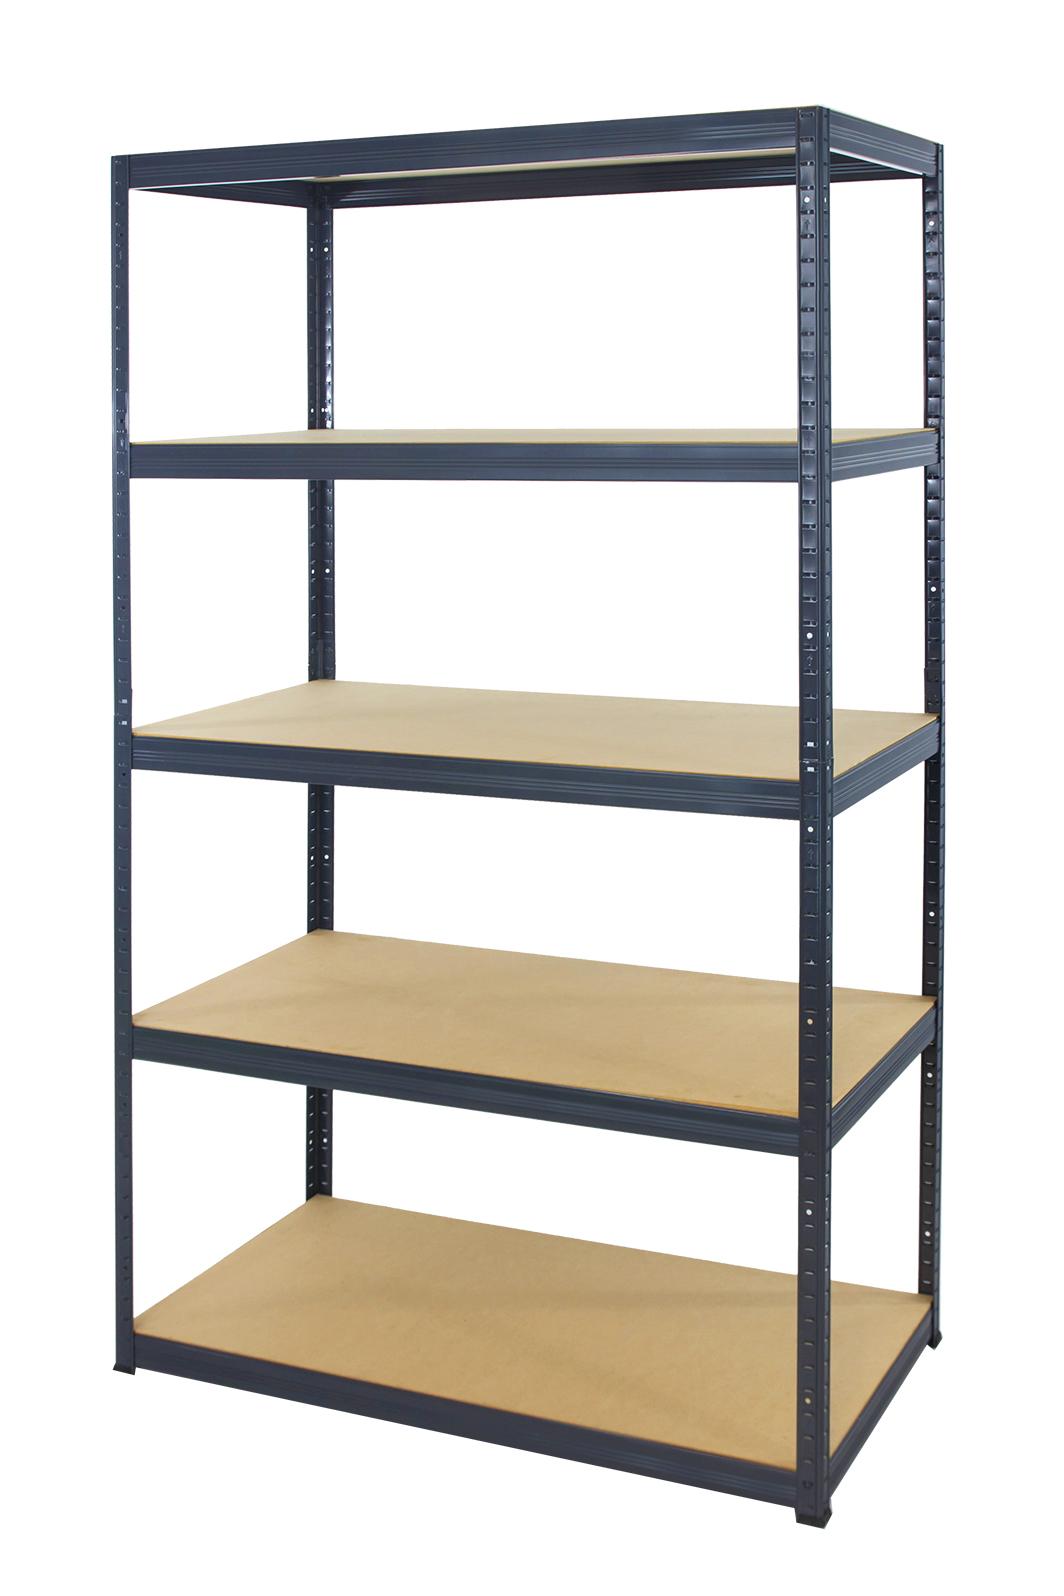 metallregal werkstatt schwerlastregal blau bunt farbig 175 275 350 400kg hnn 180 ebay. Black Bedroom Furniture Sets. Home Design Ideas